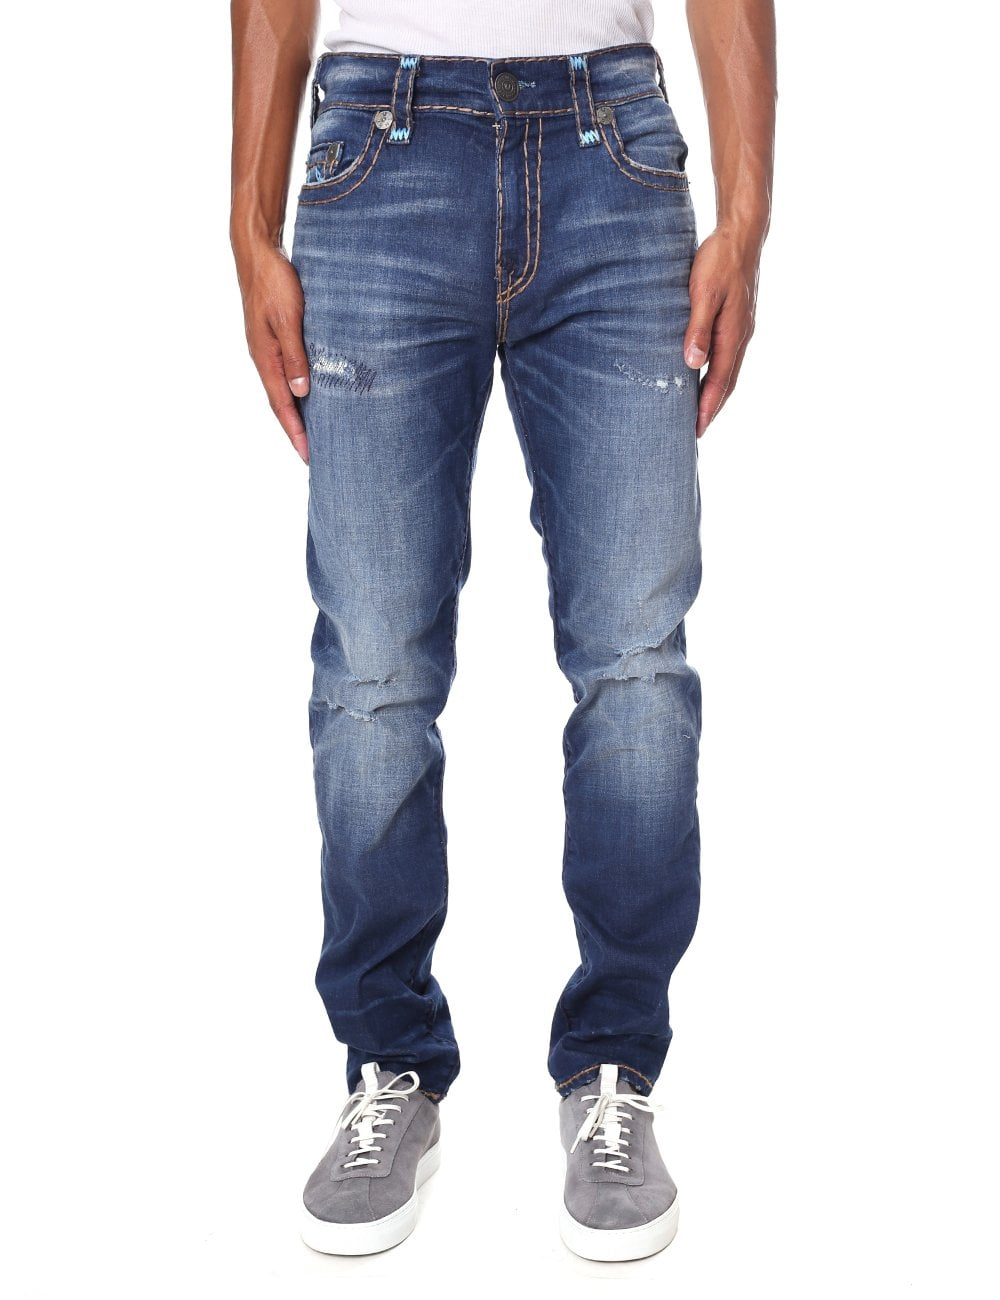 3e03c59d9 True Religion Men s Rocco Relaxed Skinny Jean